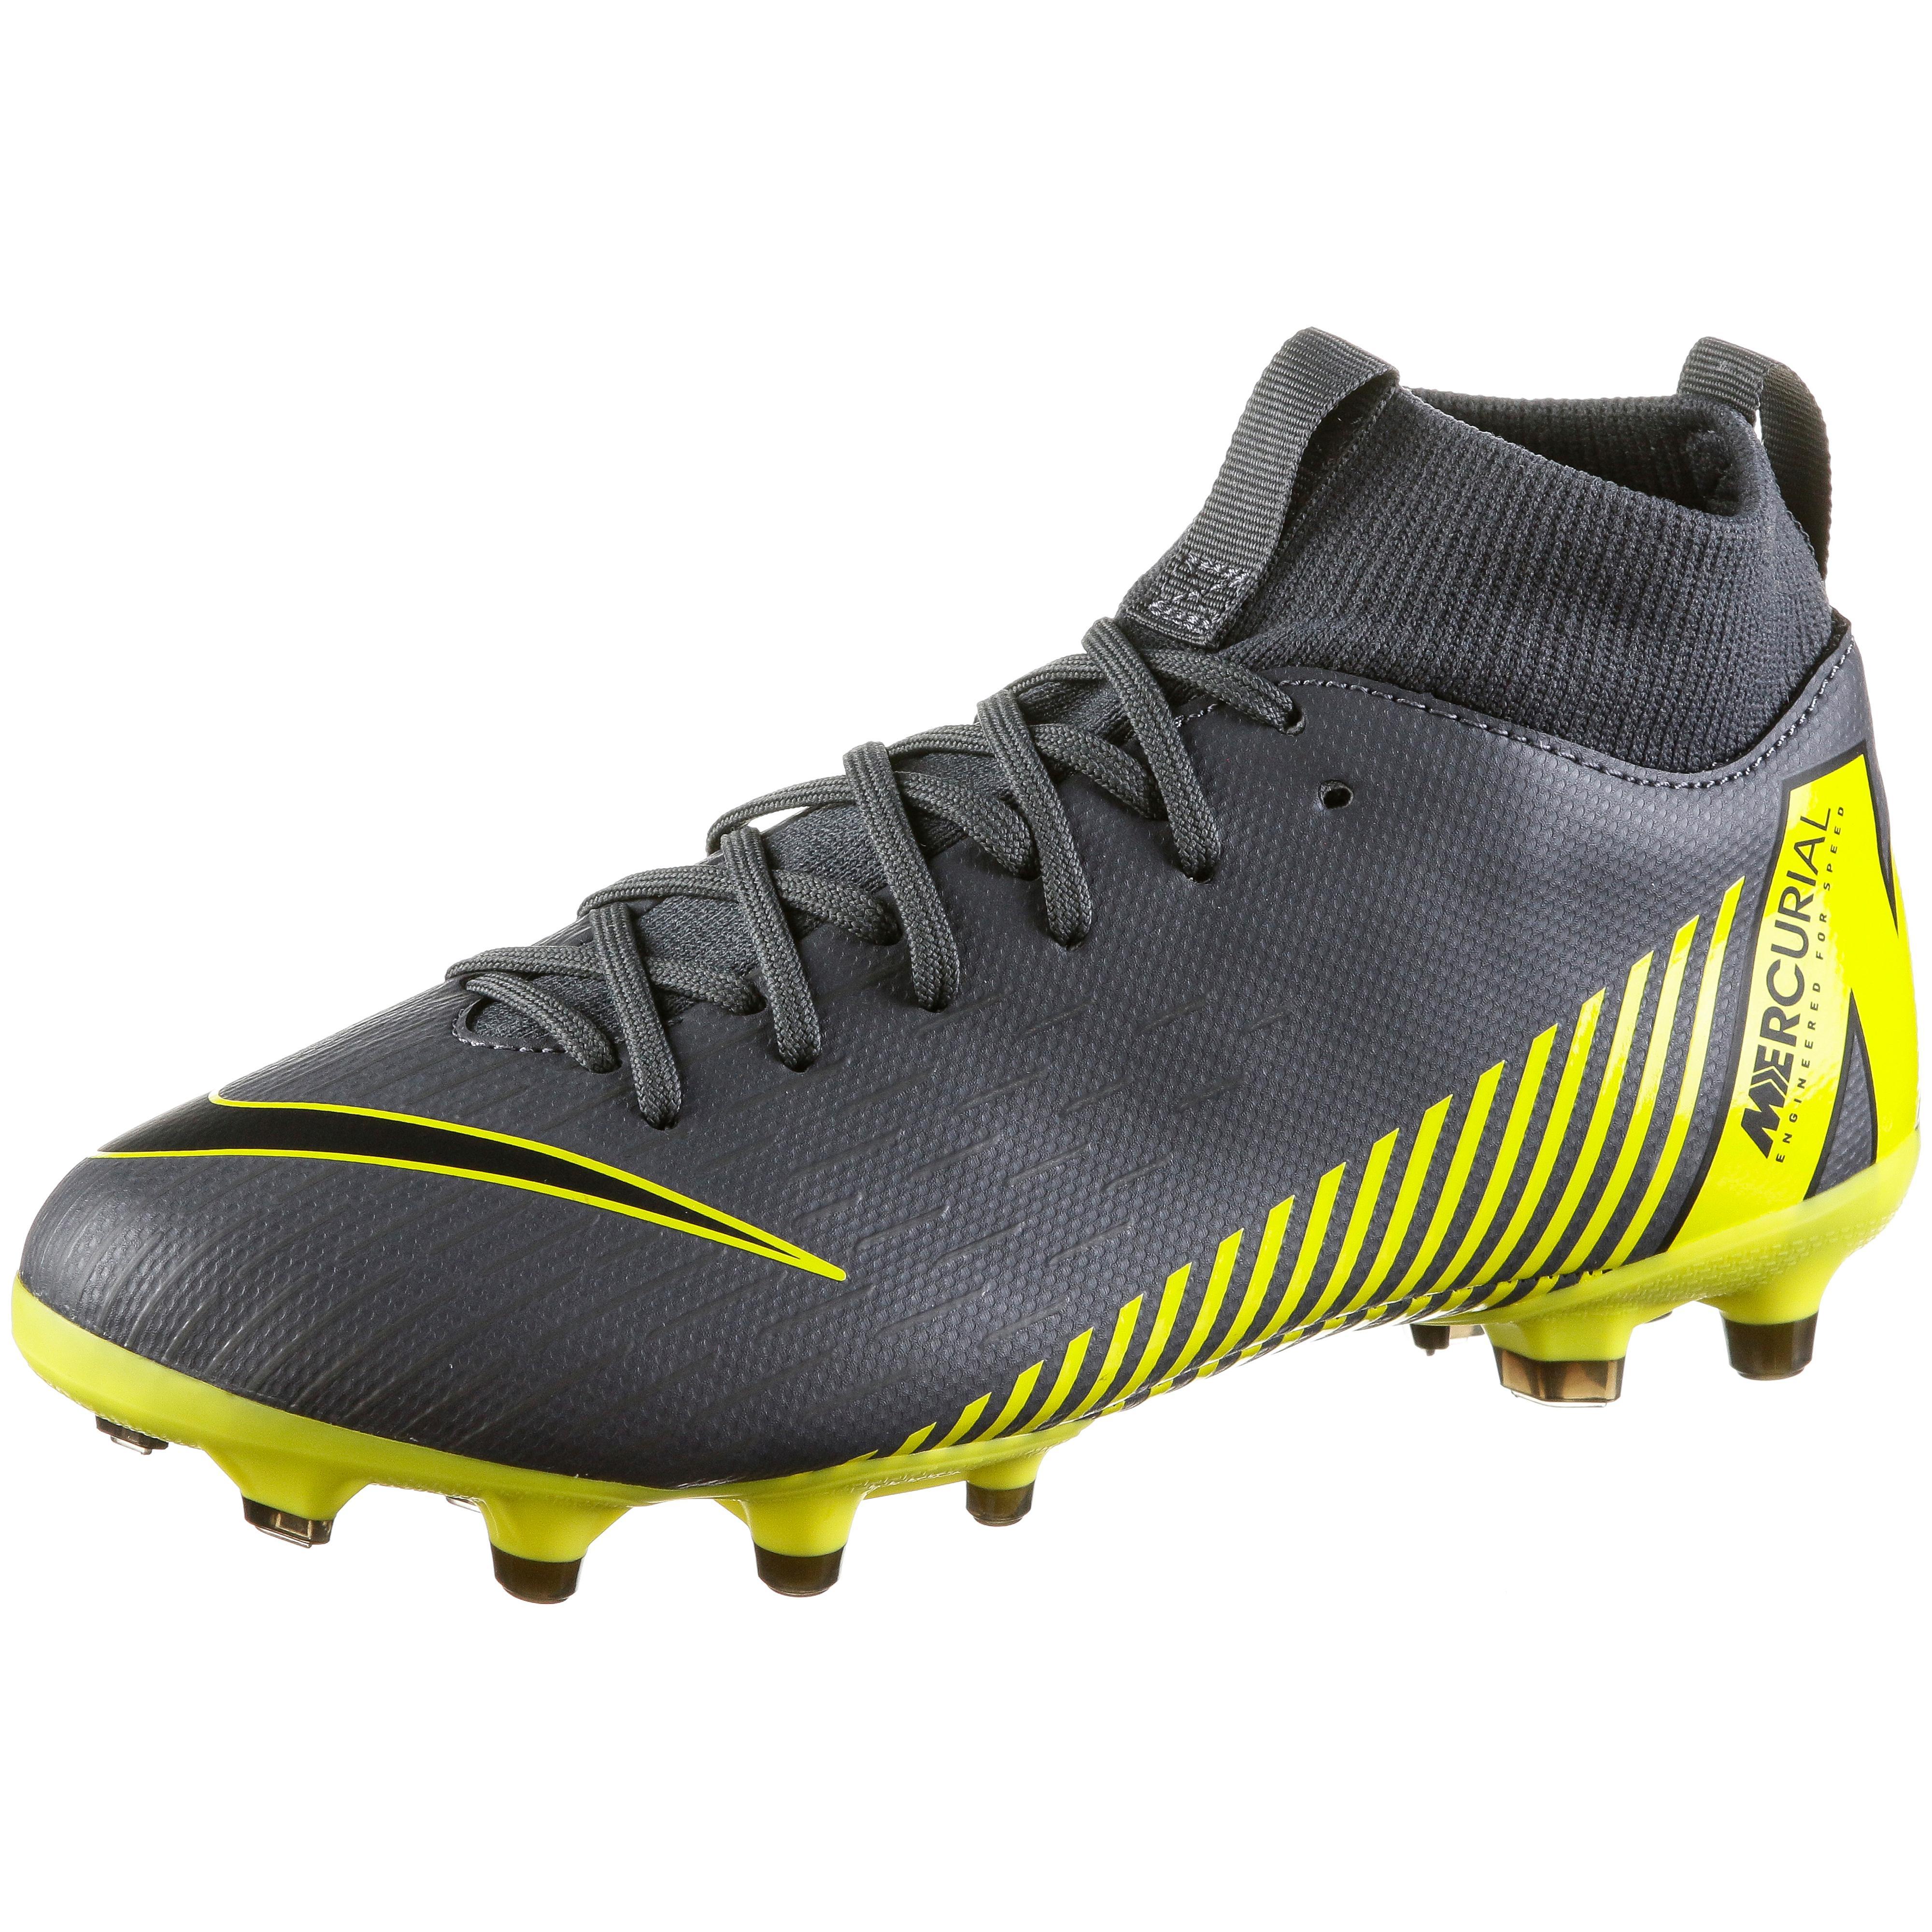 Kinder Fußballschuh Superfly Mg Grau36 5 Academy Nocken Vi Nike BshtrxdCQ